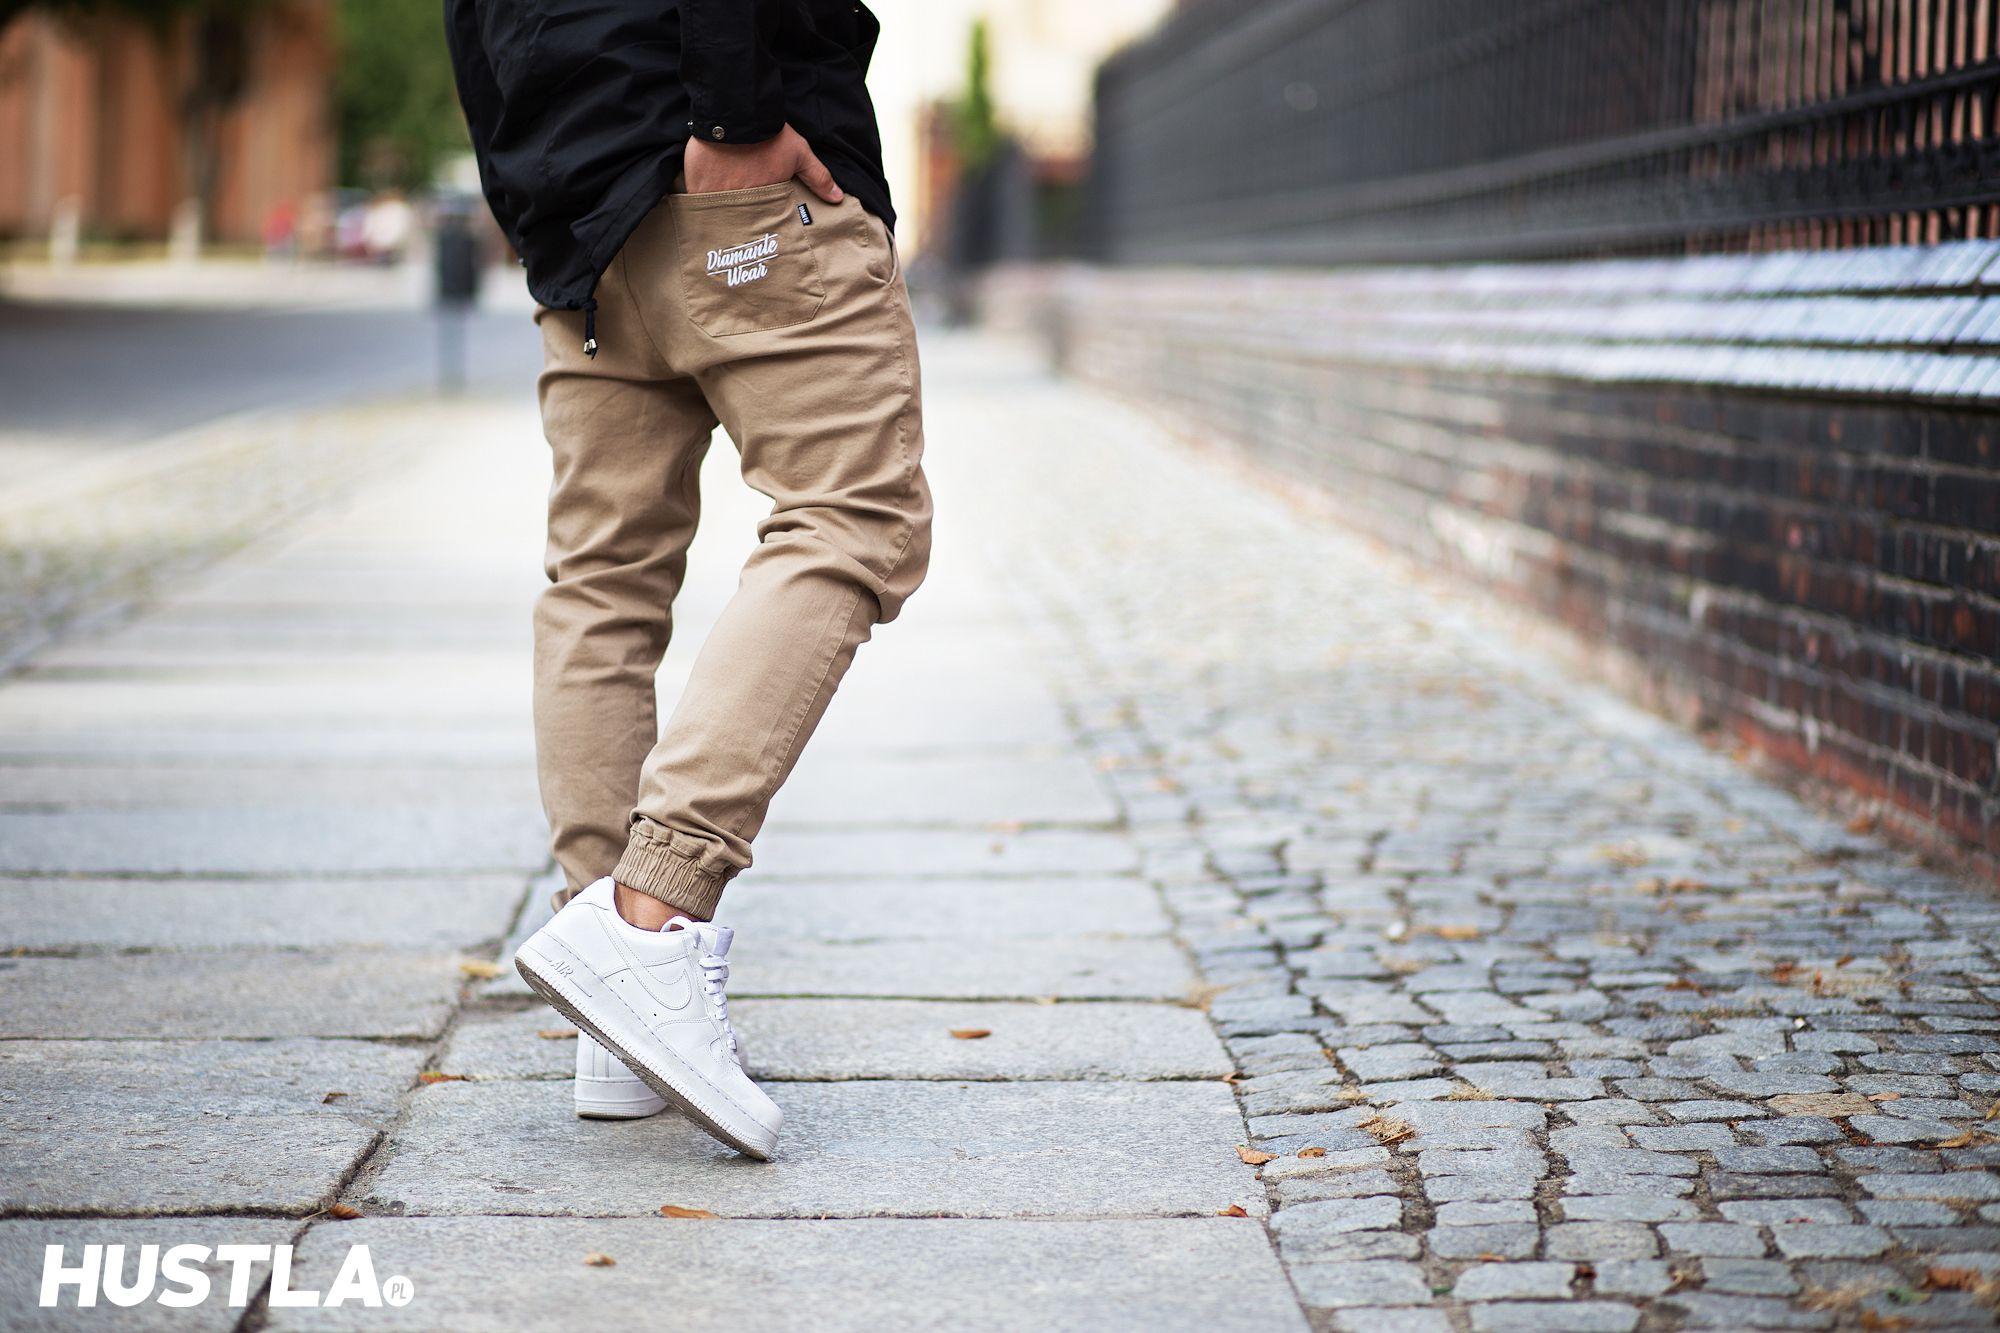 Diamante Wear Jogger Pants Fall 15 Diamantewear Diamante Wear Jogger Joggerpants Streetwear Streetfashion Snea Mens Outfits Street Style Jogger Pants